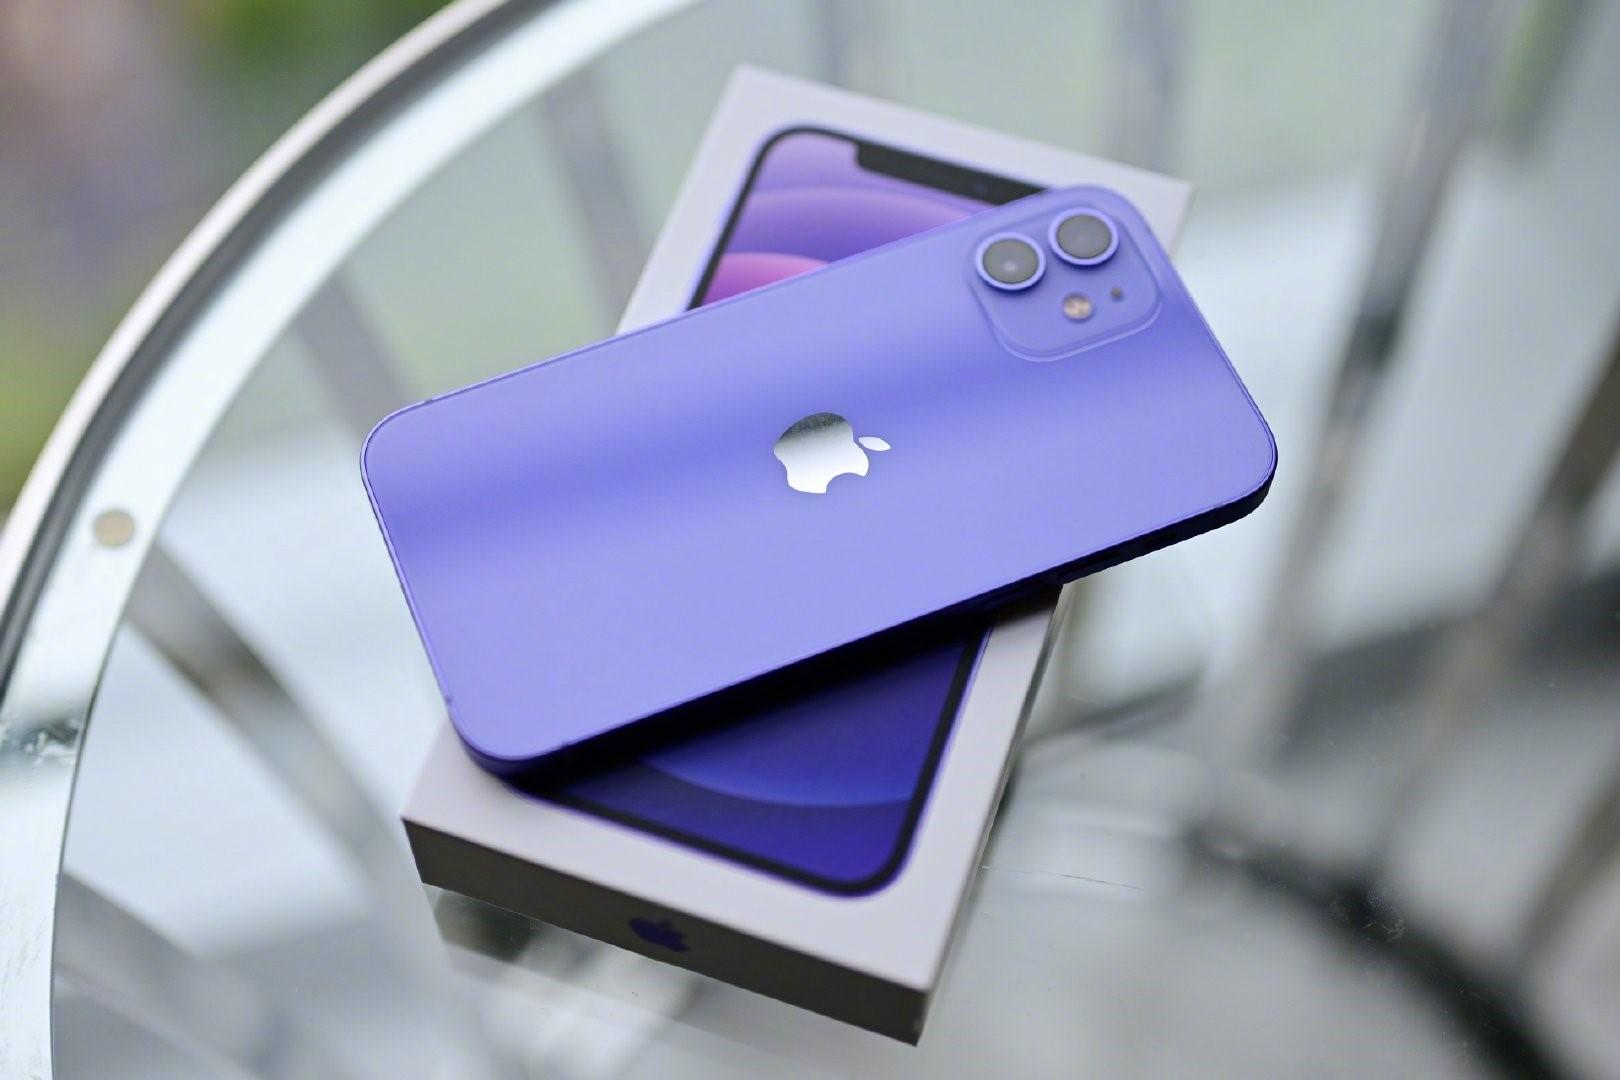 Mở hộp iPhone 12 màu tím